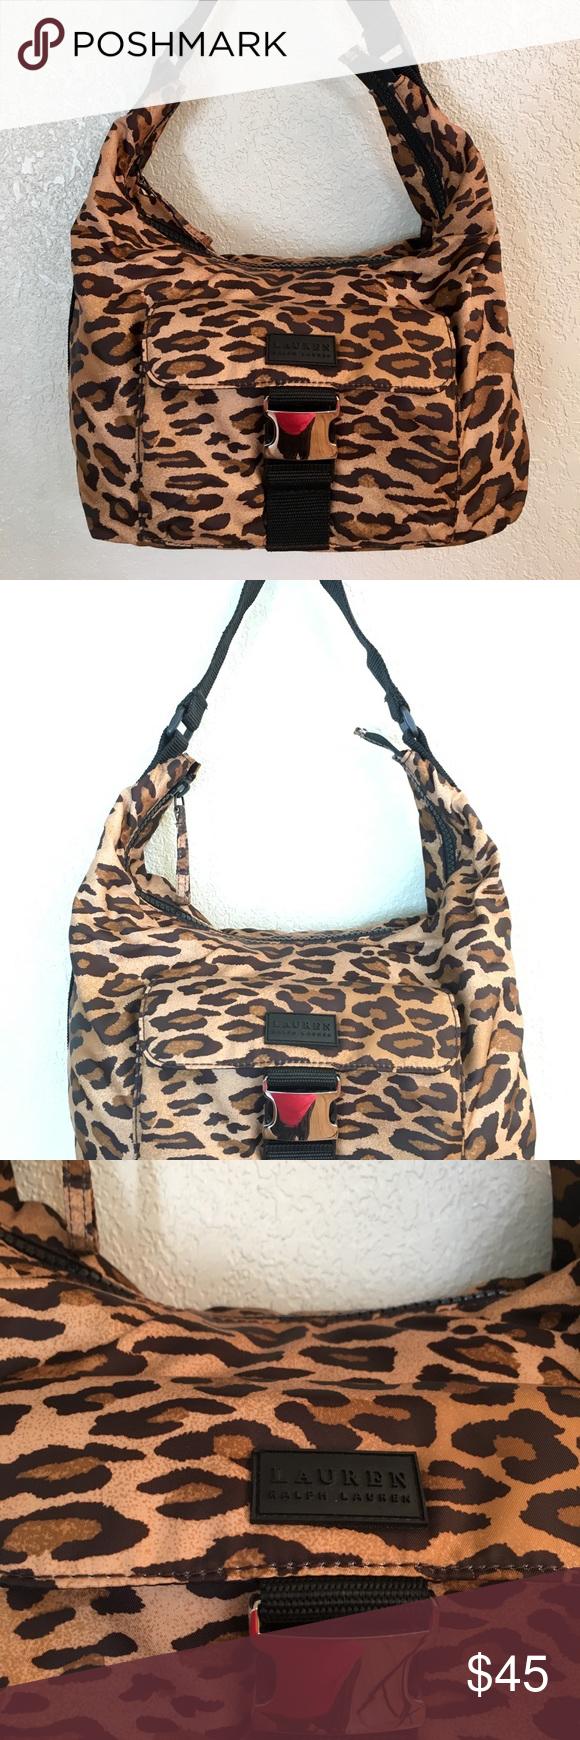 bf7068ac2c Lauren Ralph Lauren Cheetah Nylon Shoulder Handbag Brand- Lauren Ralph  Lauren Style- Shoulder Material